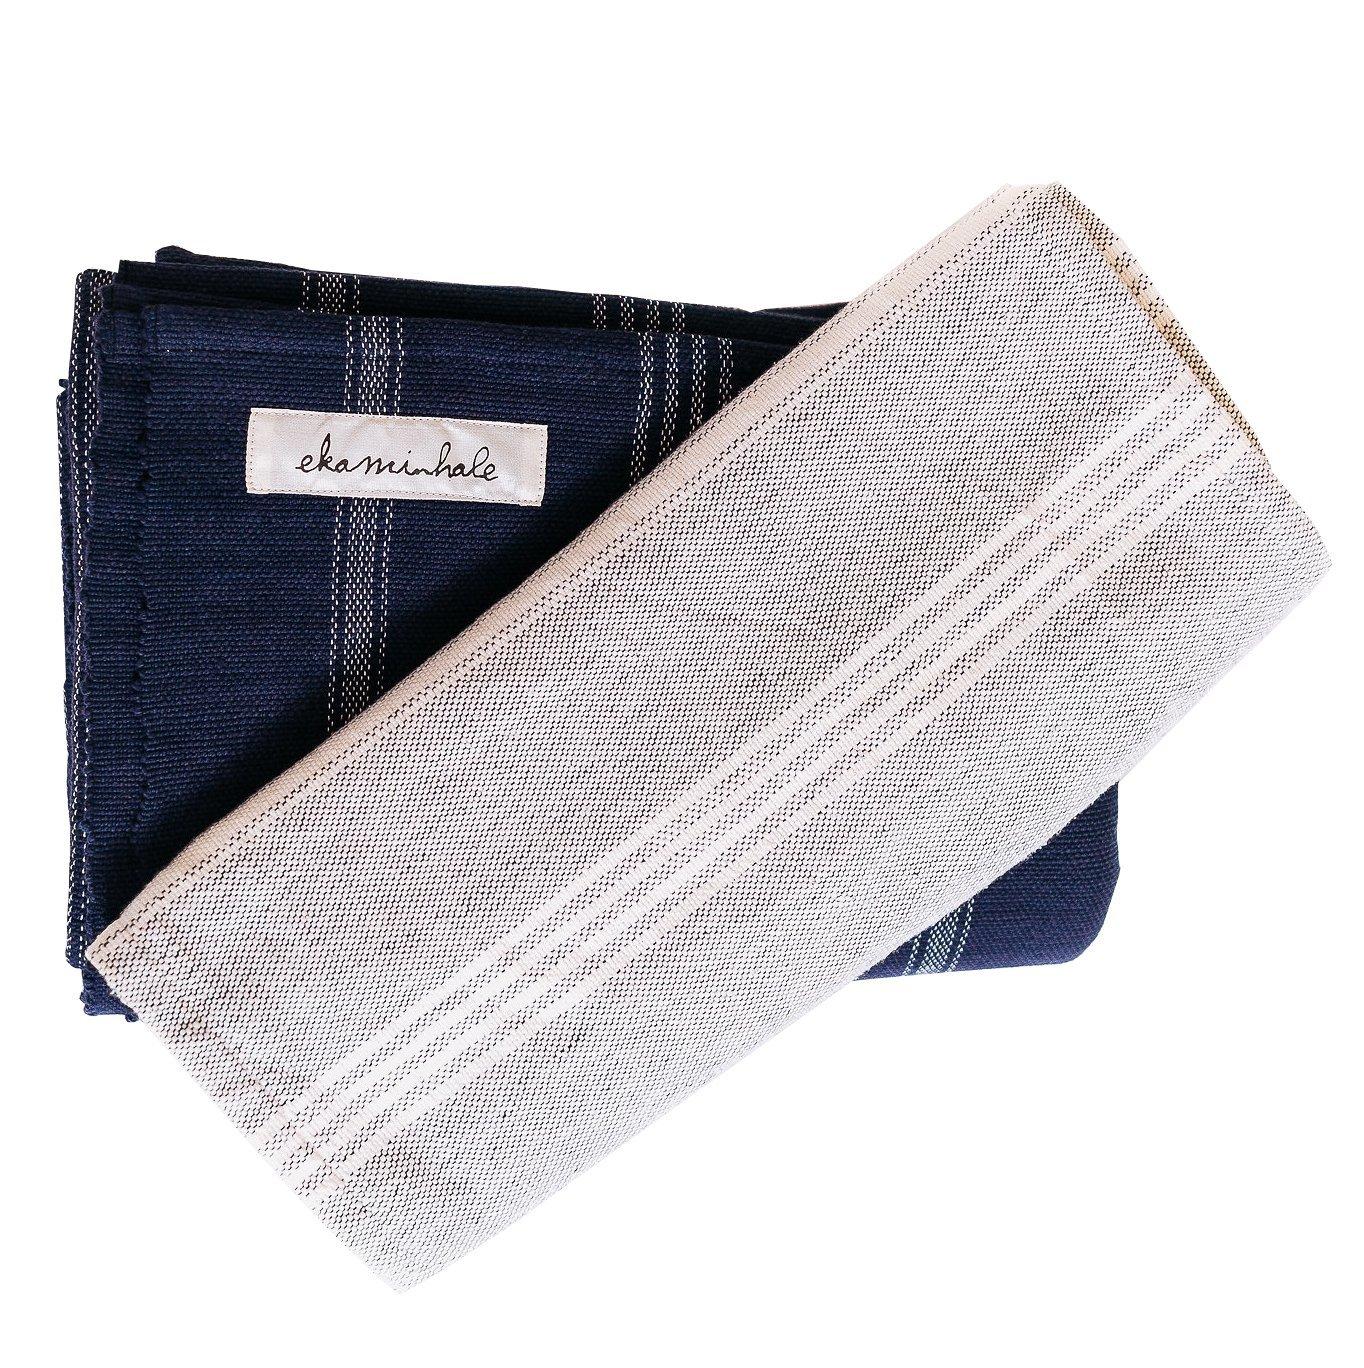 Ekaminhale Organic Cotton Yoga Blanket